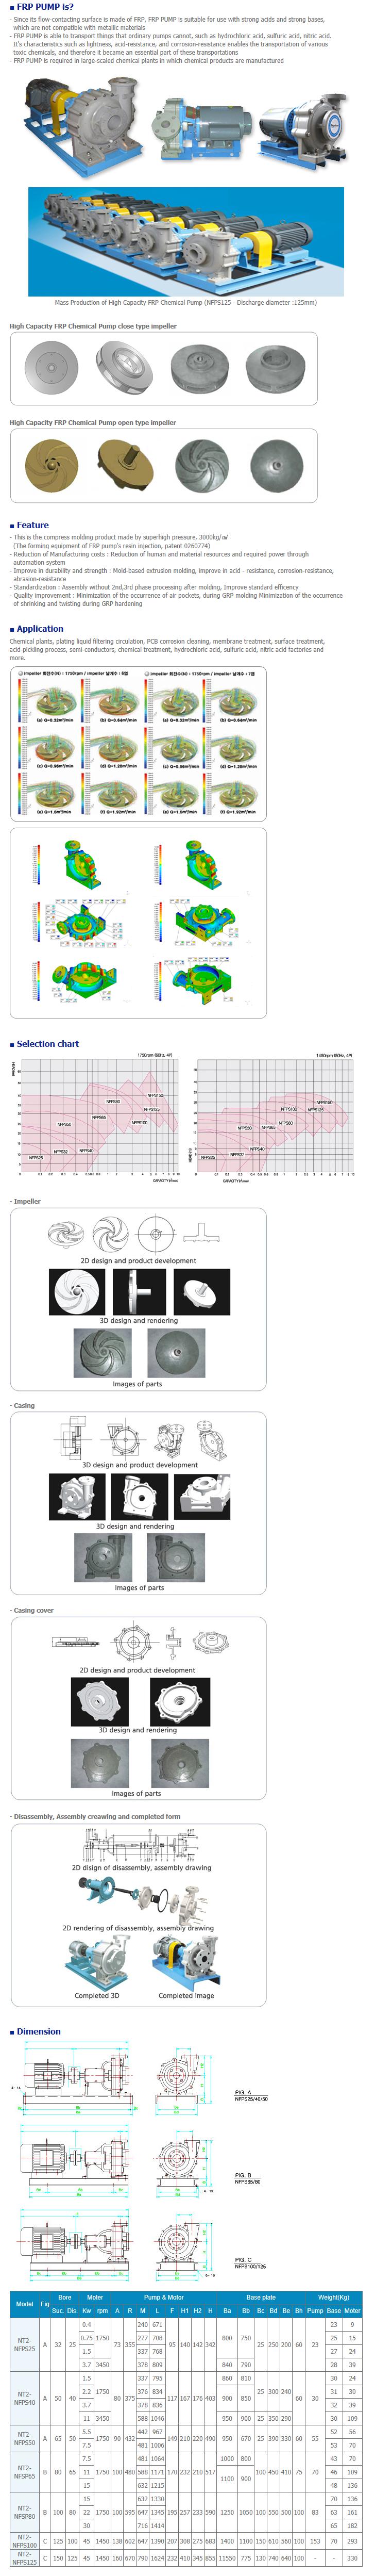 NEGATRON GRP Pump NT2- NFPS Series